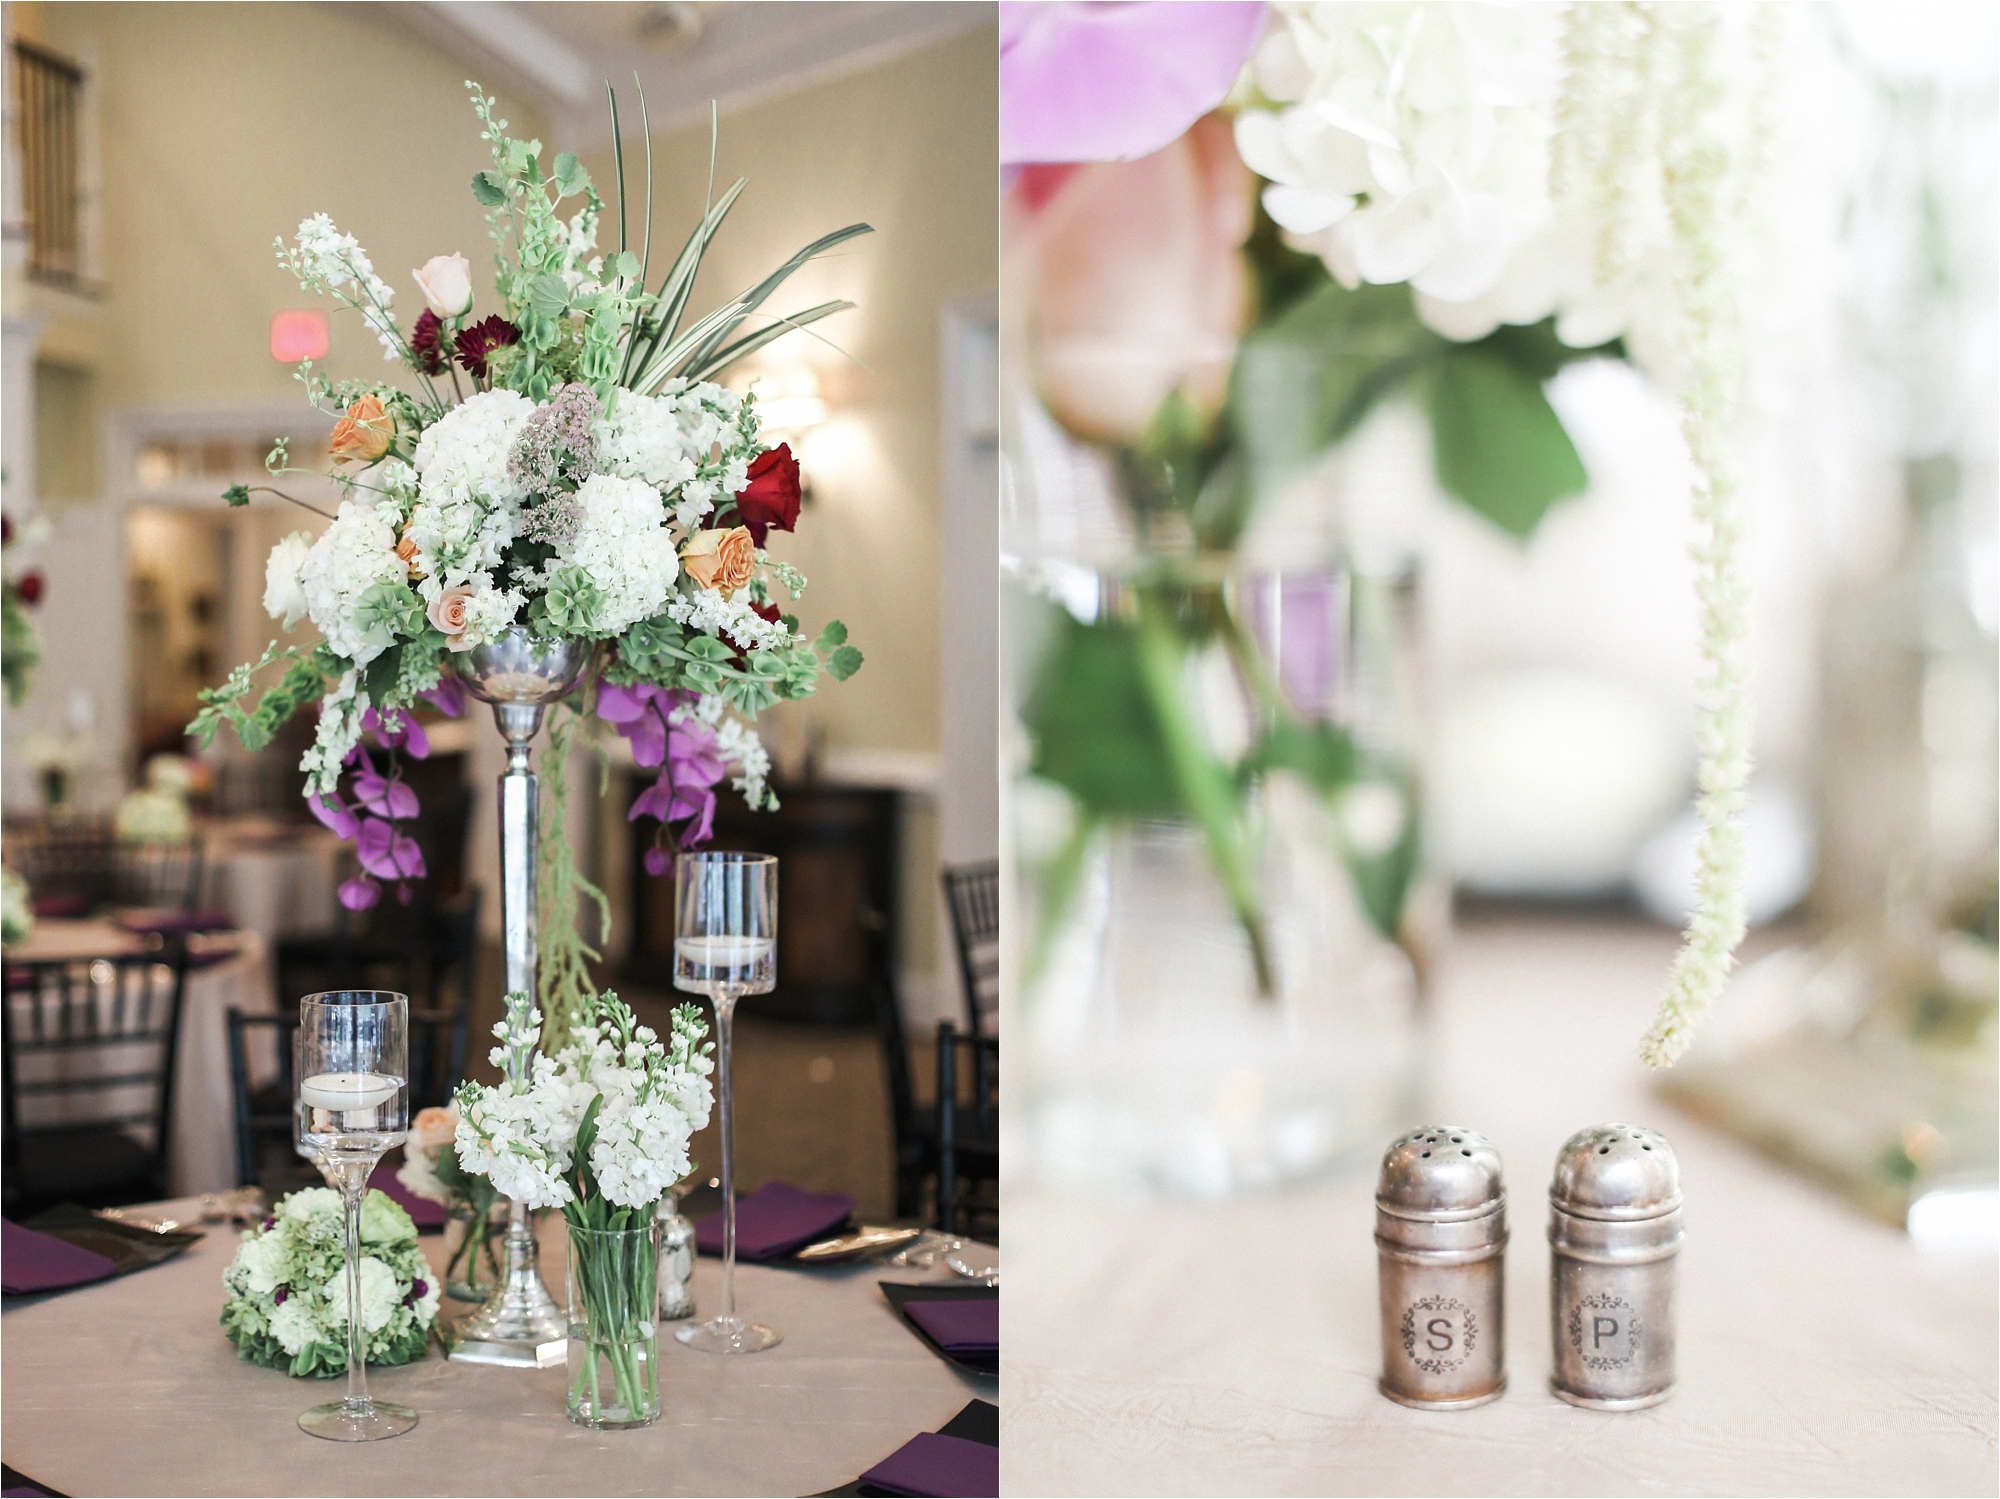 stephanie-yonce-photography-richmond-virginia-bohemian-outdoor-wedding-photo_0036.jpg